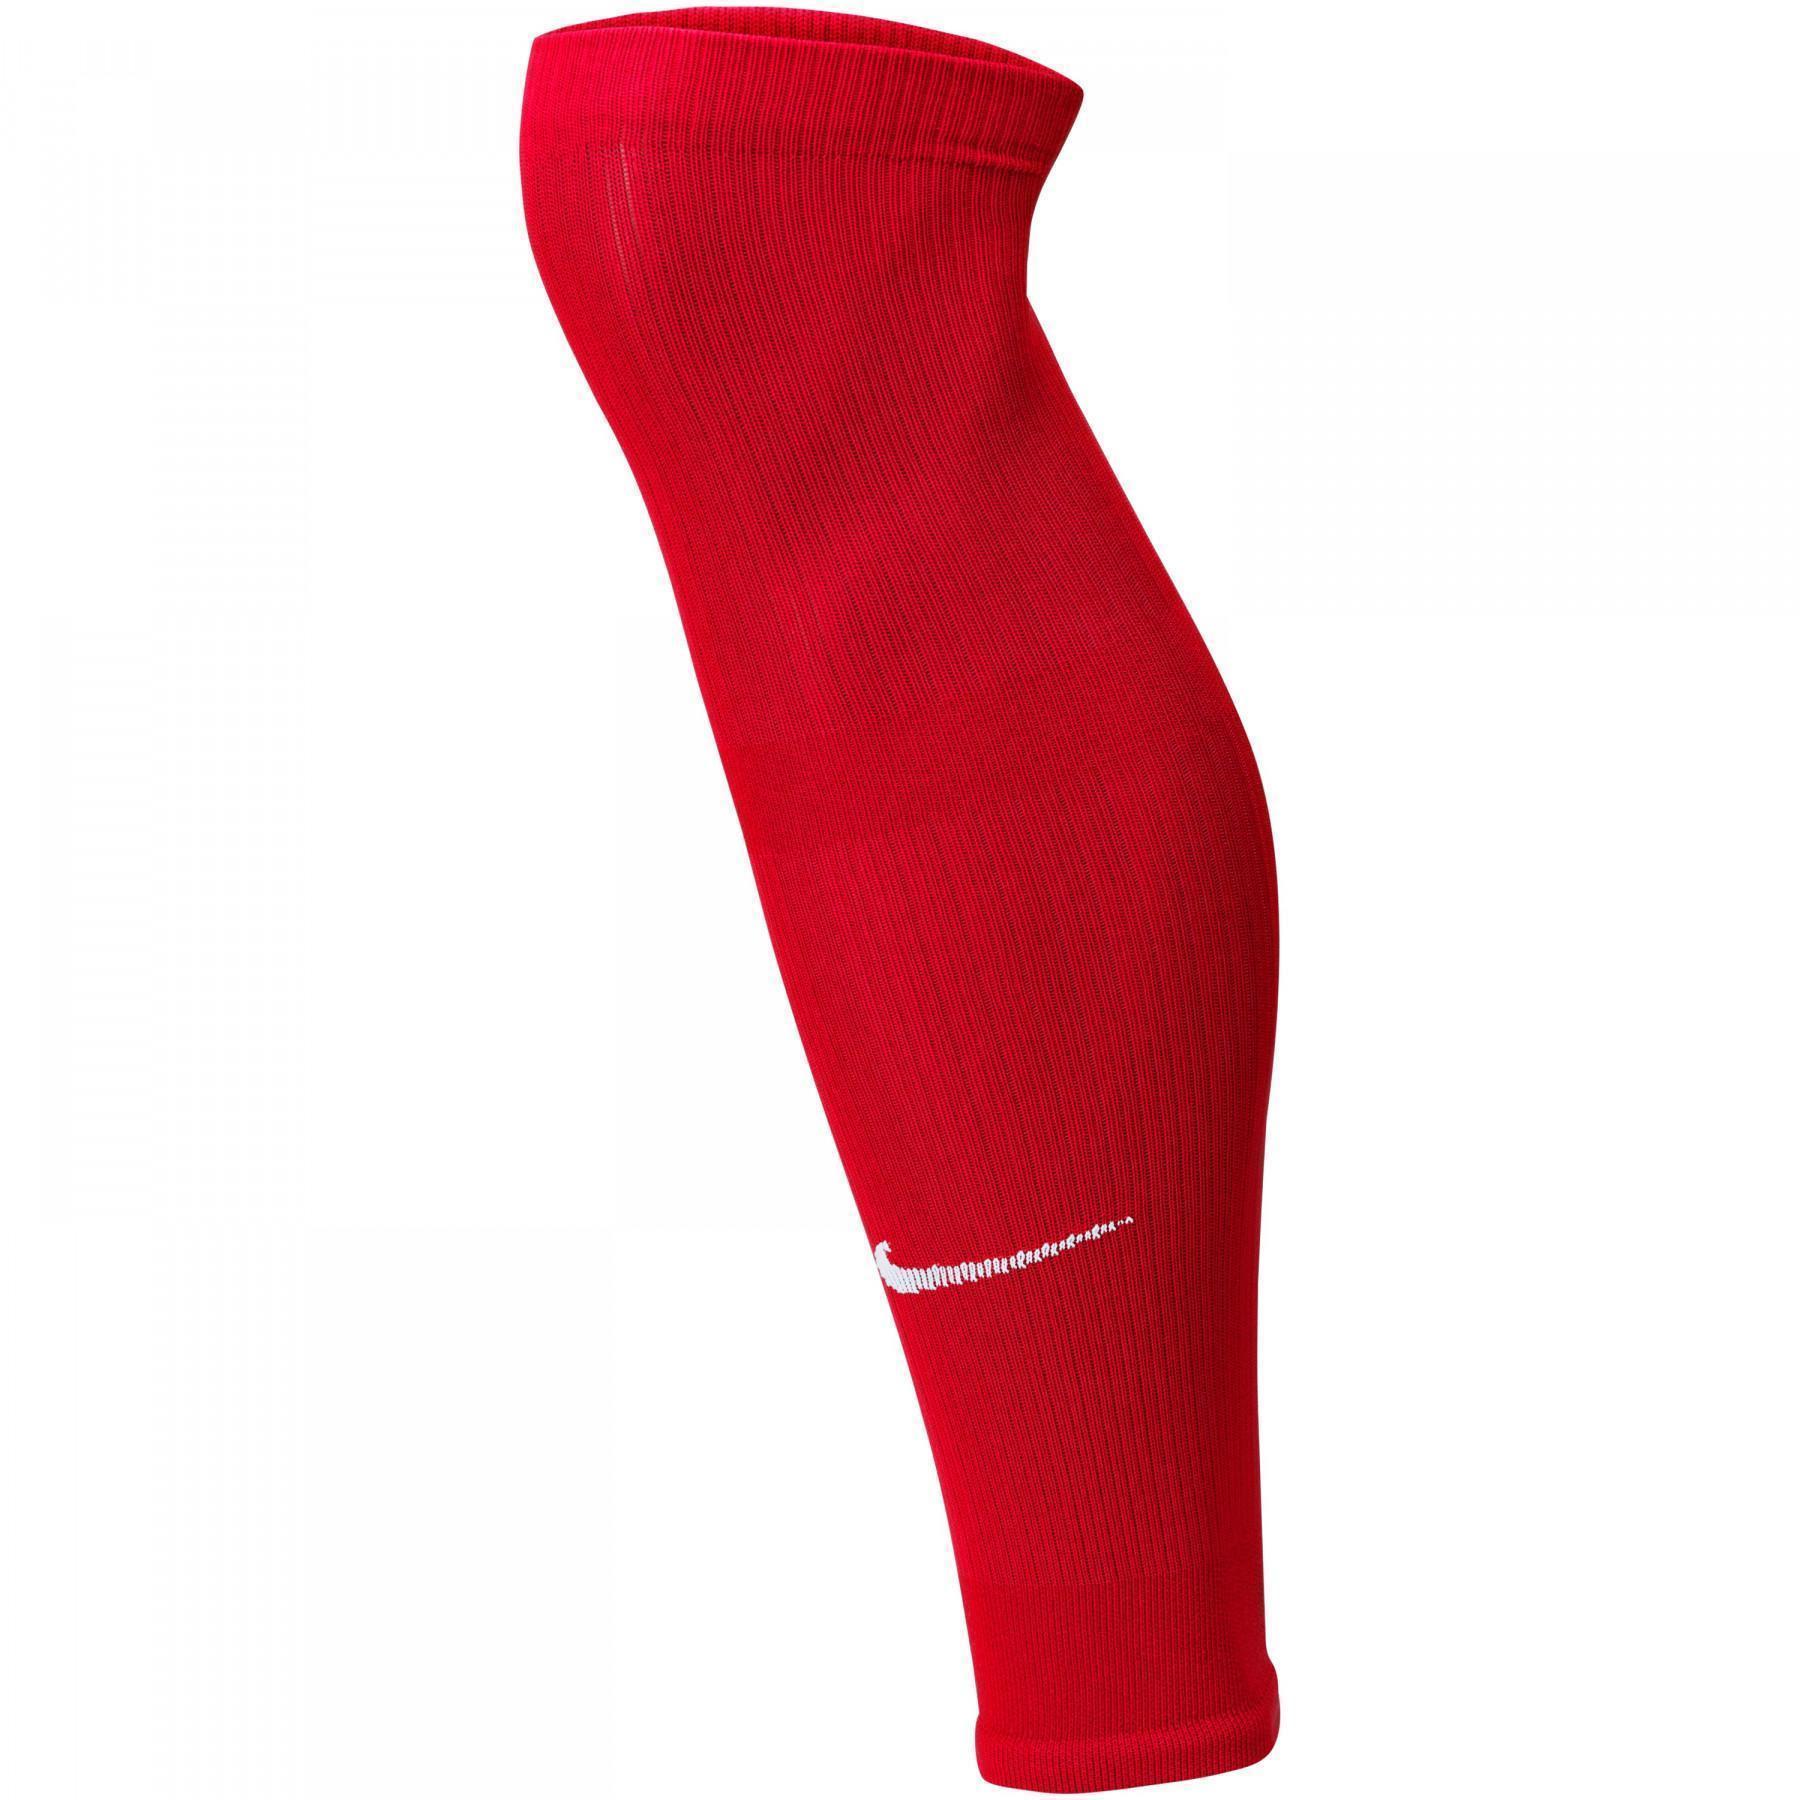 Aquecedor de pernas Nike Squad